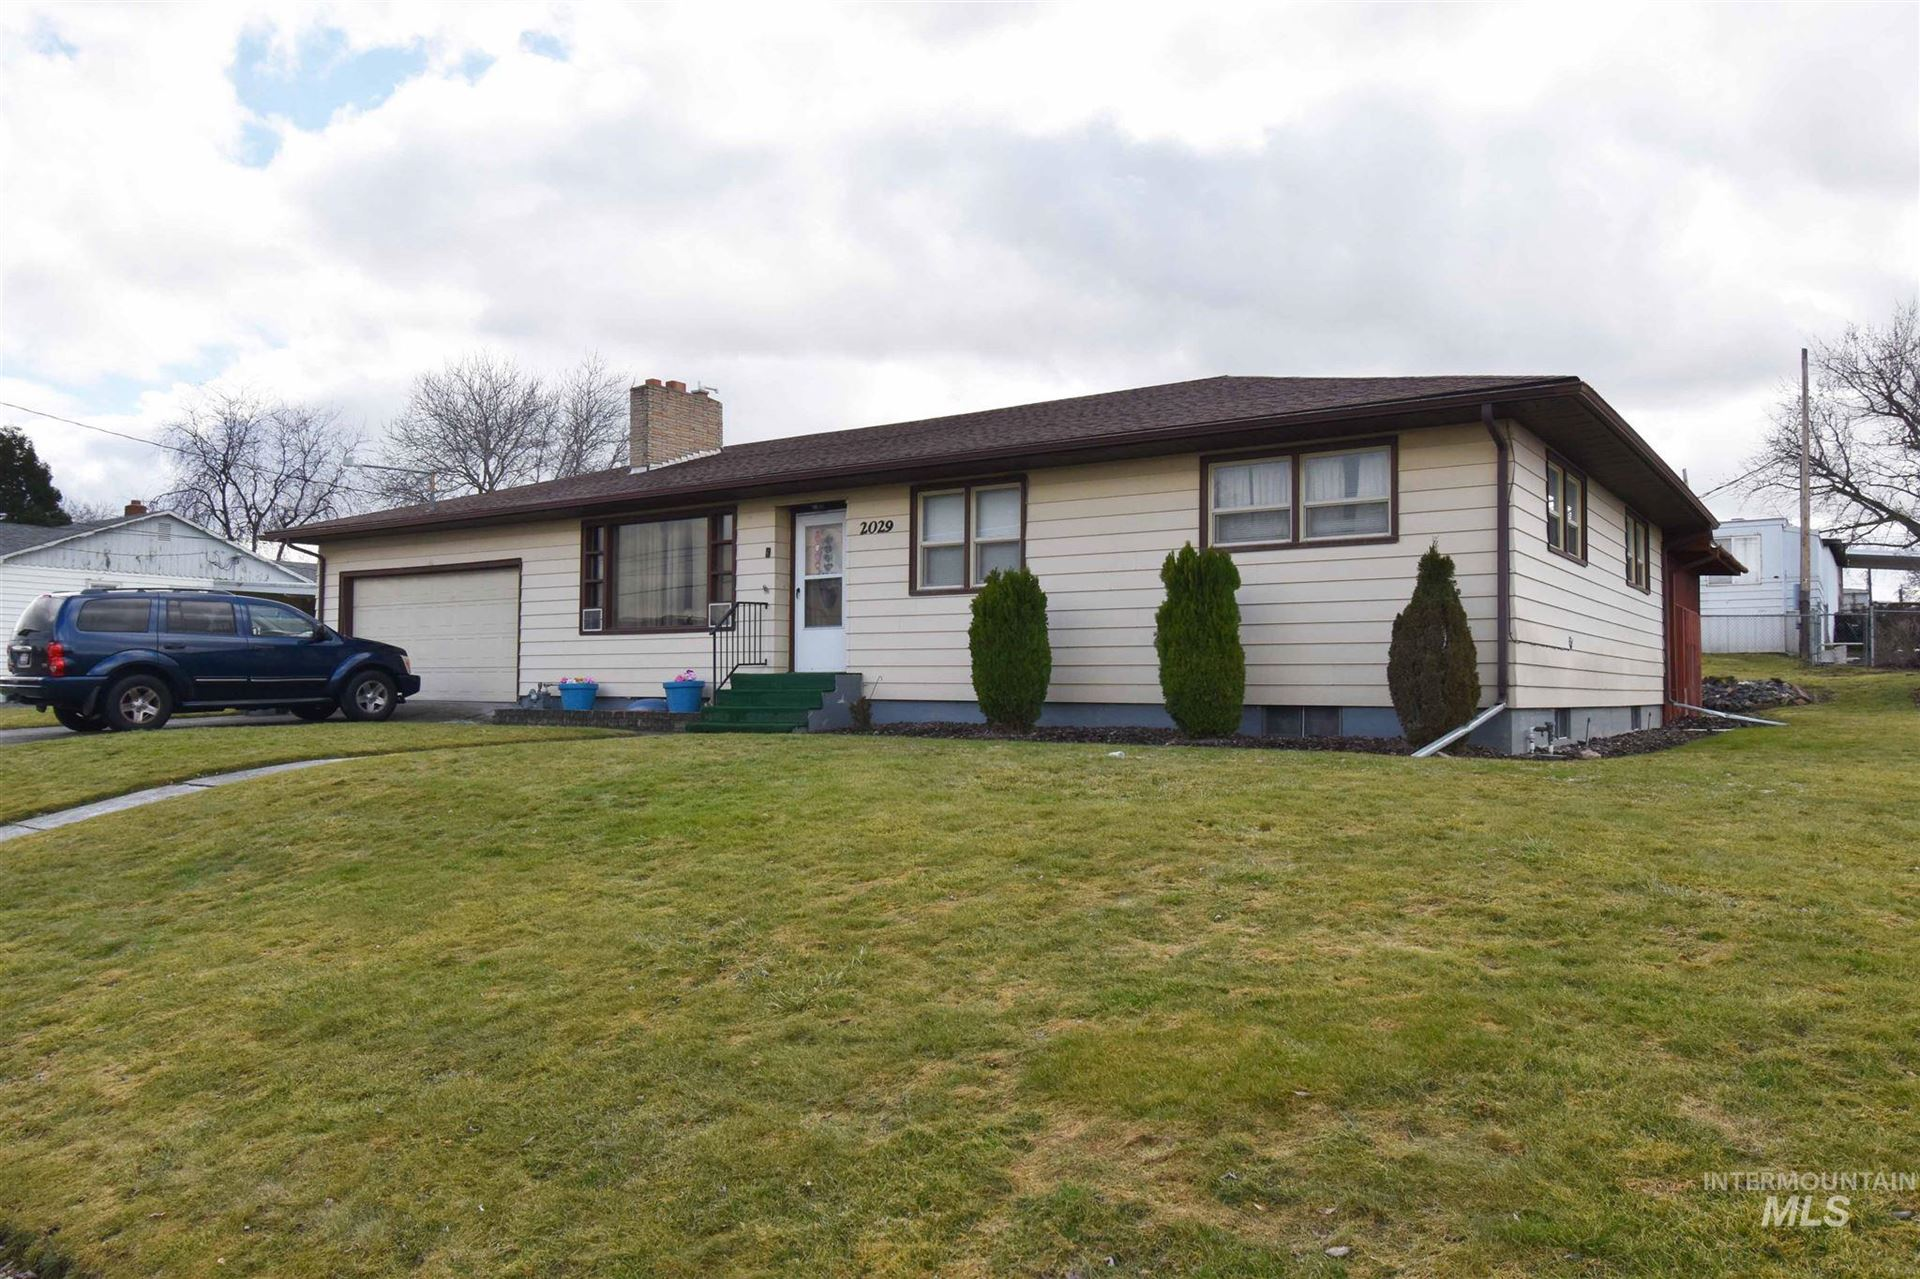 Photo of 2029 Valleyview Drive, Clarkston, WA 99403 (MLS # 98794829)